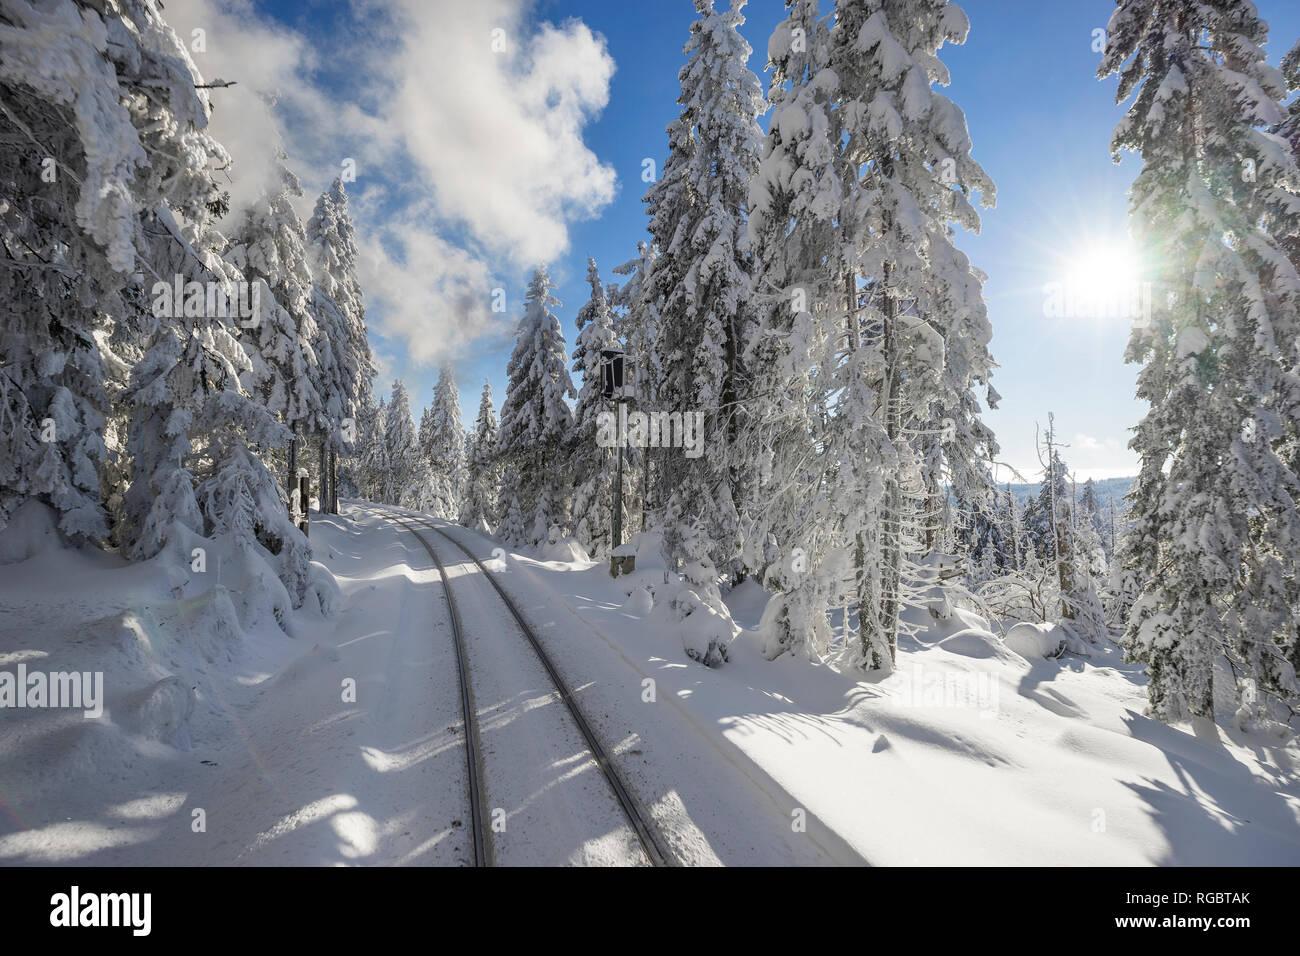 Germany, Saxony-Anhalt, Harz National Park, Brocken, rail tracks of Harz Narrow Gauge Railway in winter against the sun - Stock Image